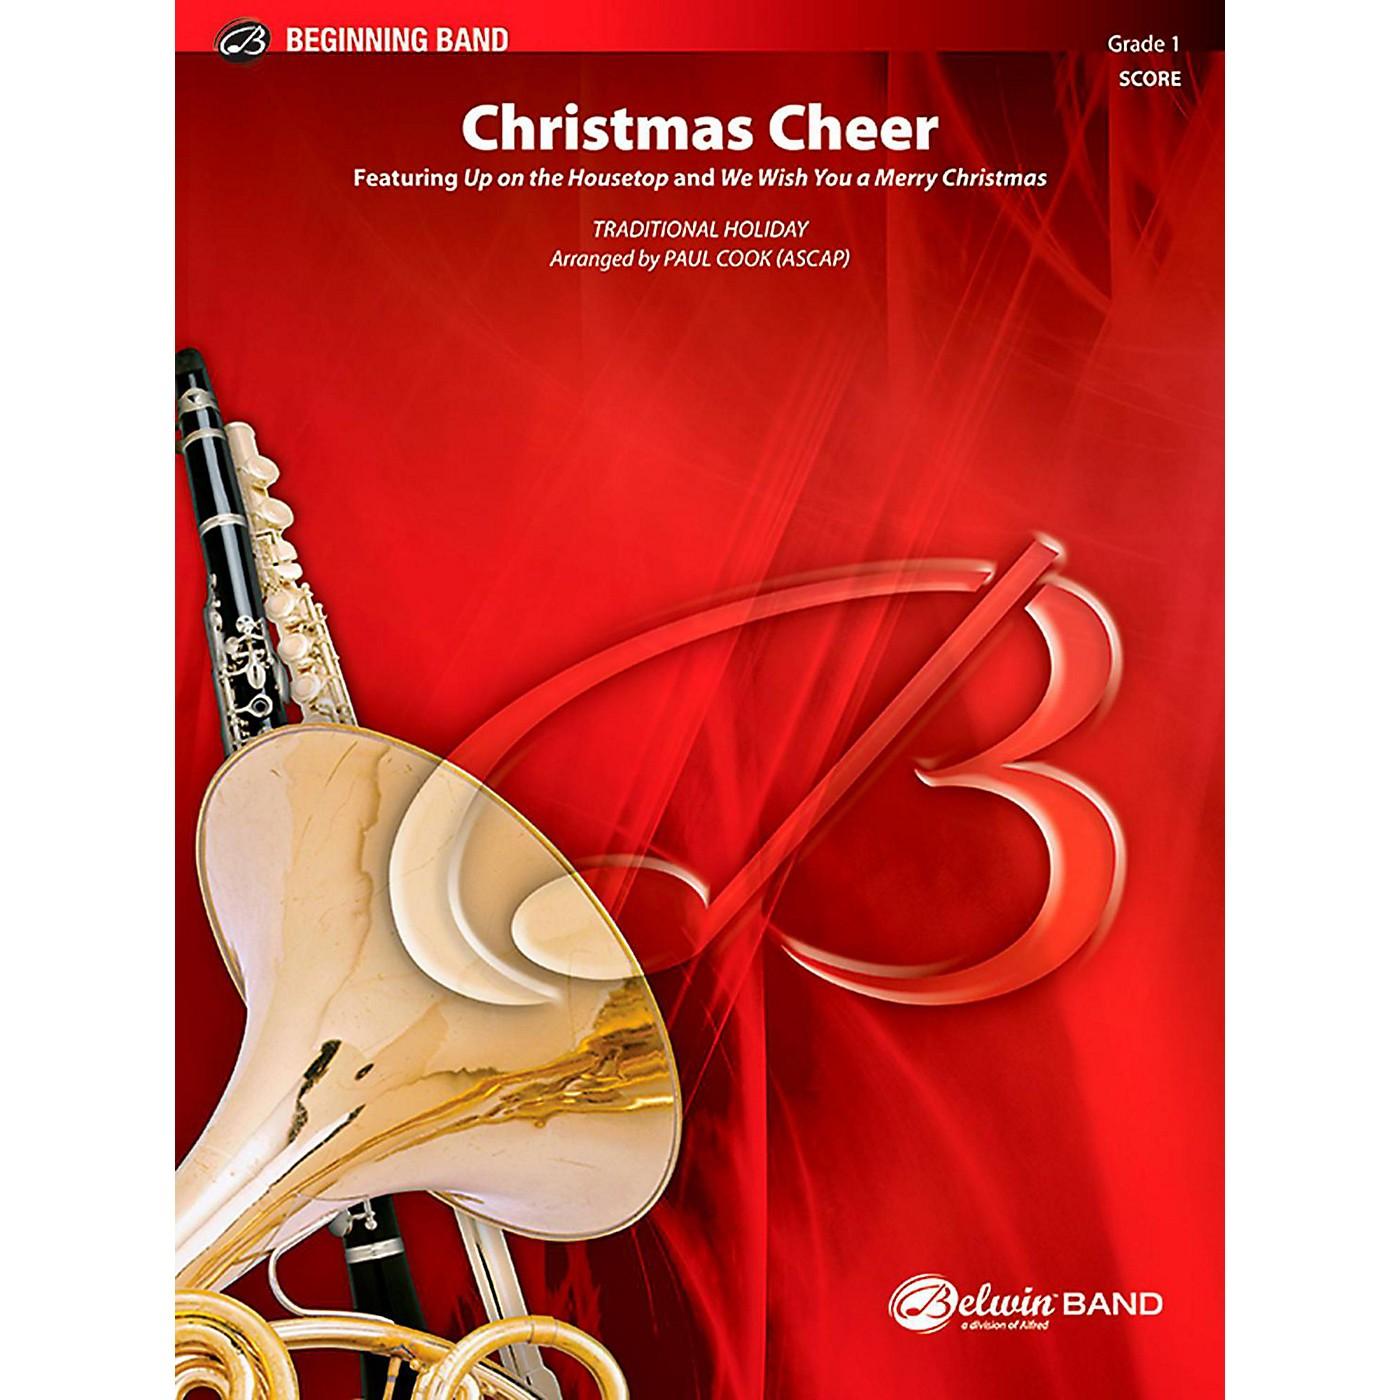 BELWIN Christmas Cheer Concert Band Grade 1 (Very Easy) thumbnail